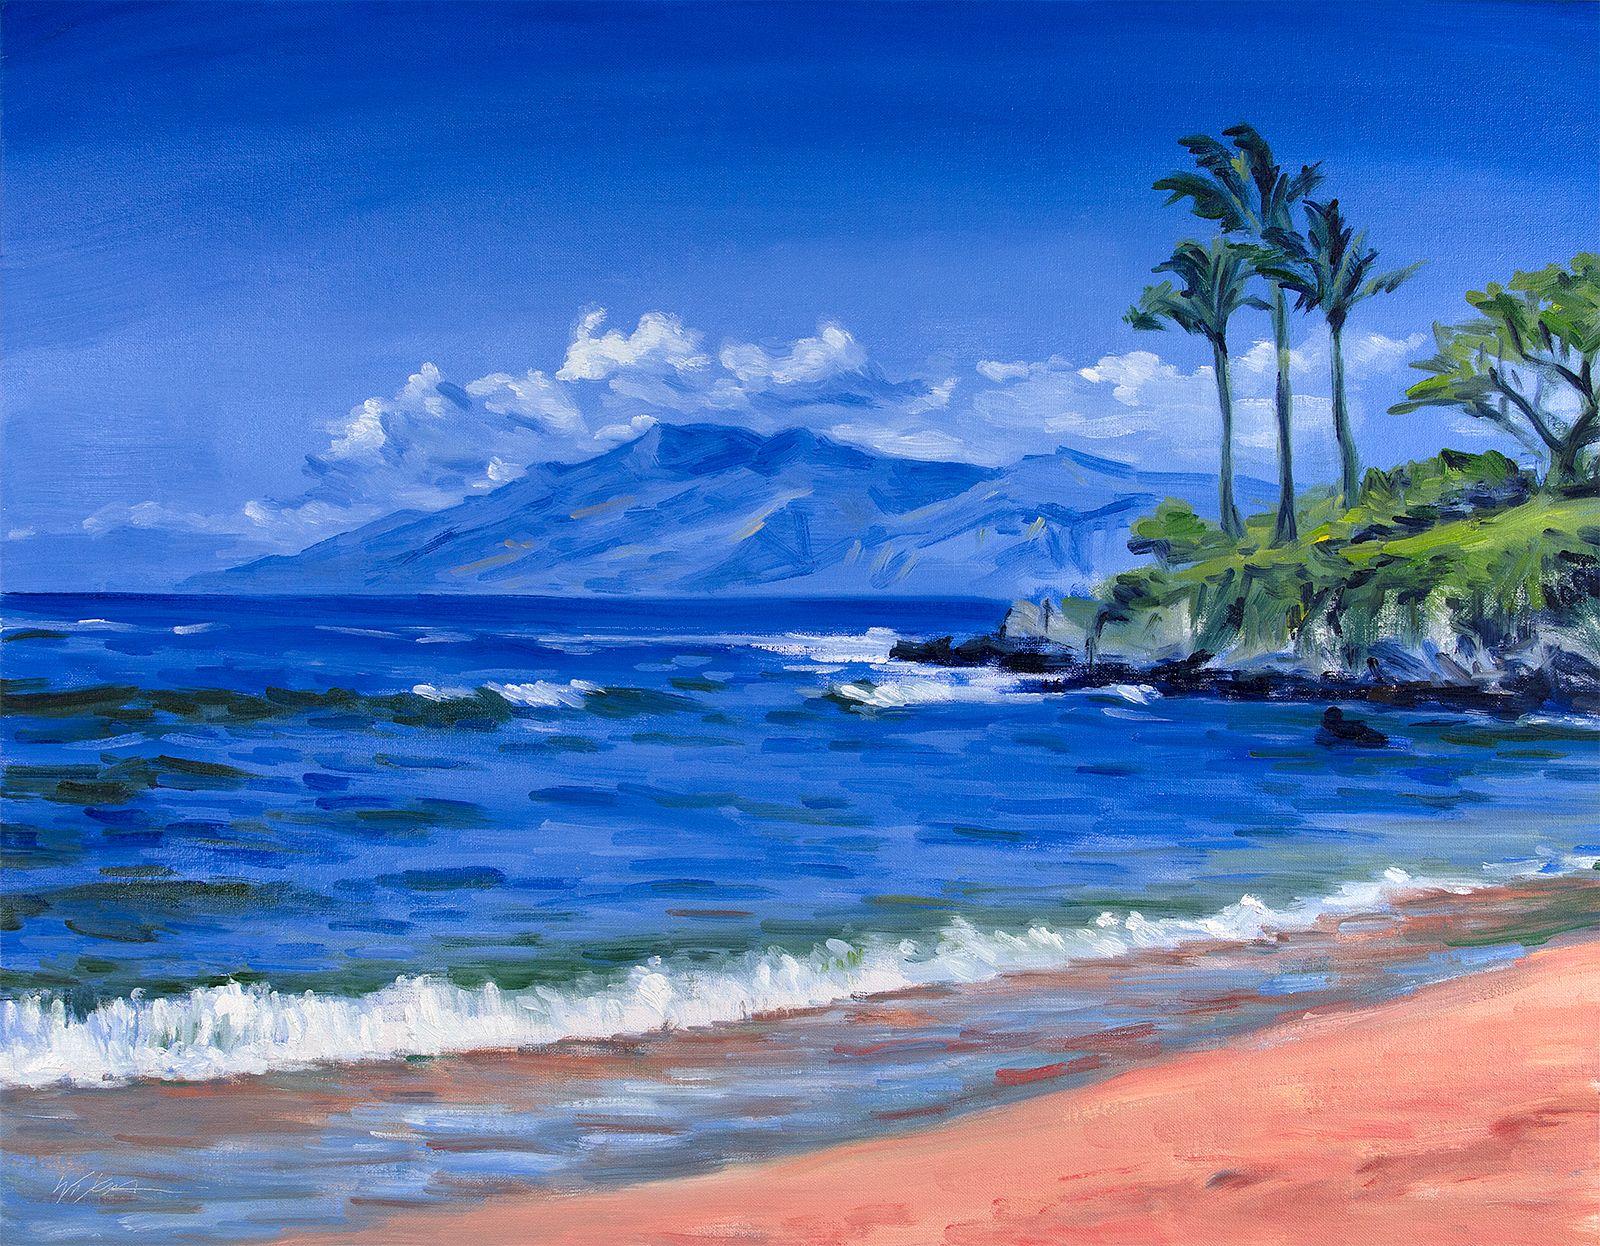 Original Painting Waves Palms And Sky At Maui Beach Ocean Landscape Painting Beach Art Painting Beach Landscape Art